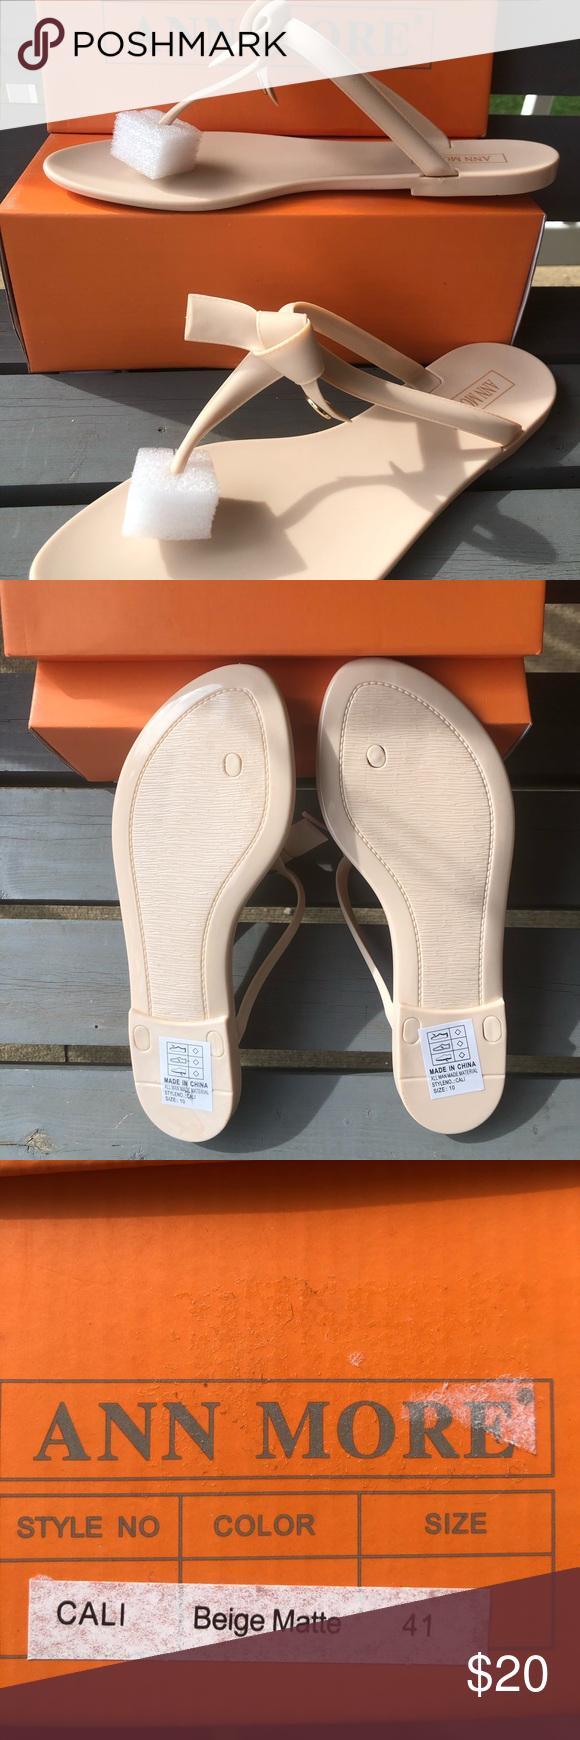 Nwt Ann Moore Beige Sandal Size 10 Beige Sandals Beige Sandals